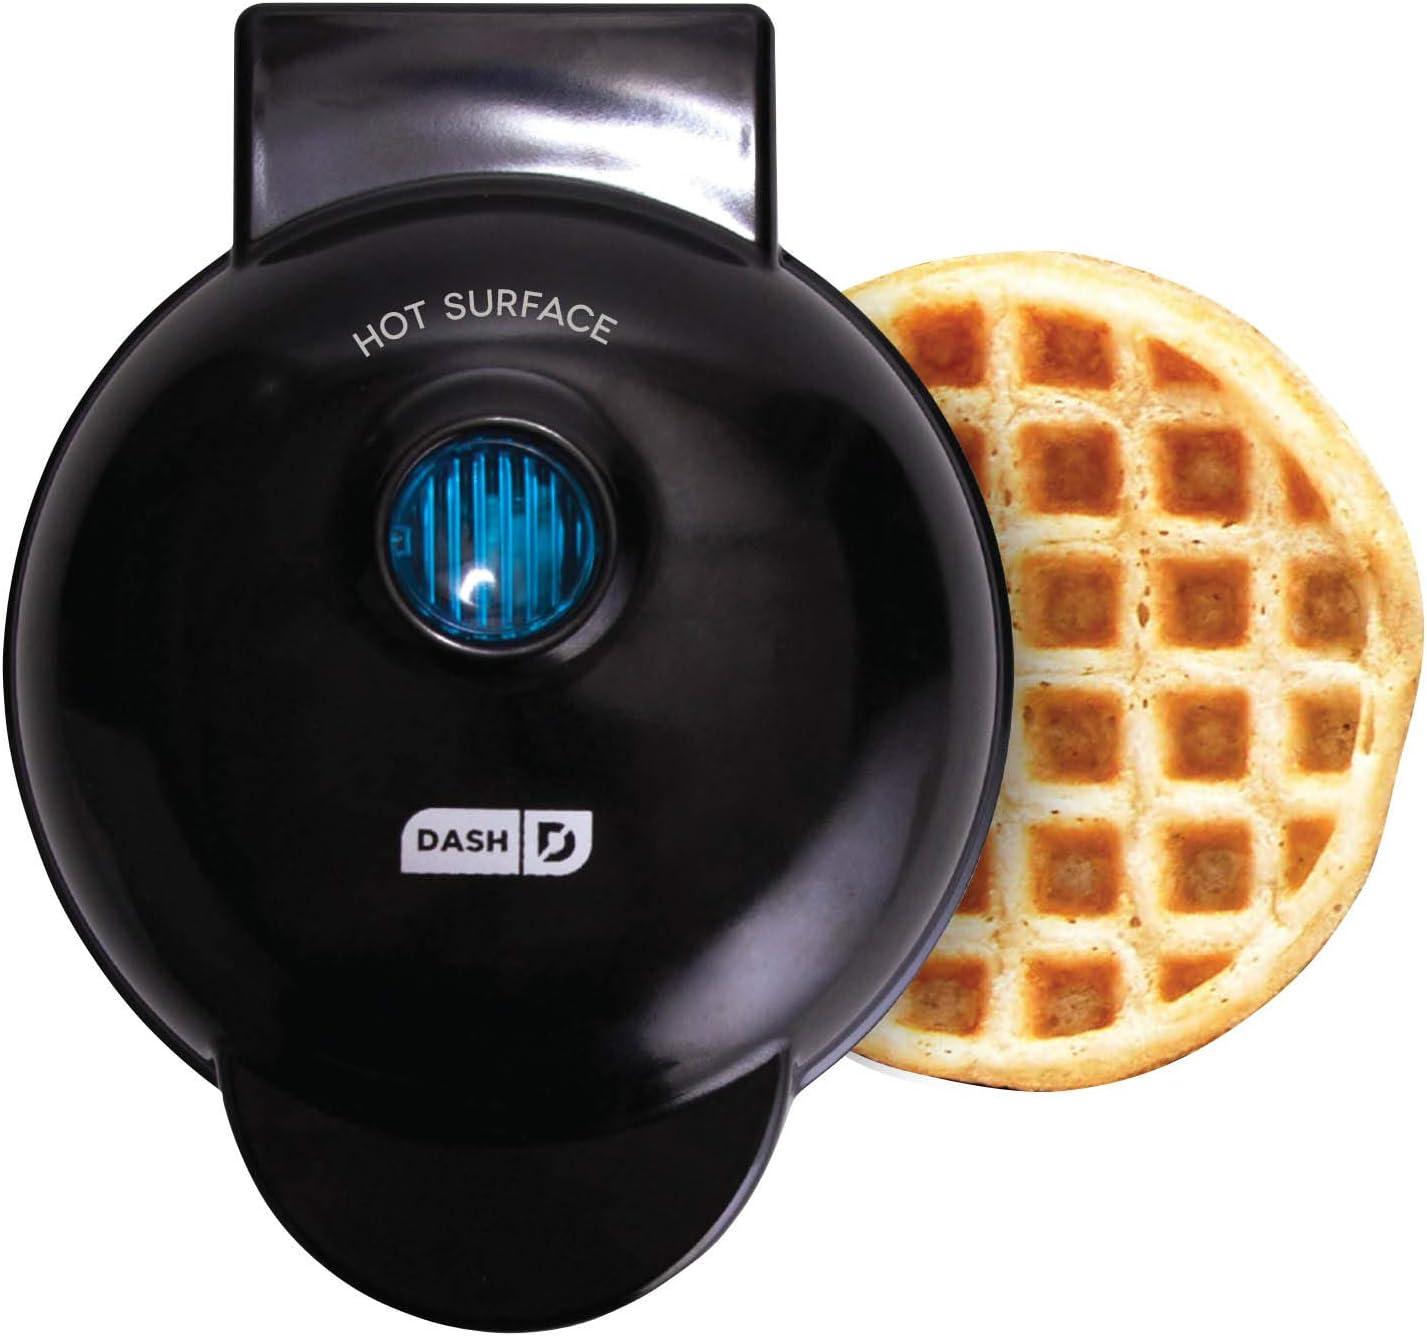 Best mini waffle maker (Best inexpensive waffle maker / waffle maker cheapest in America)